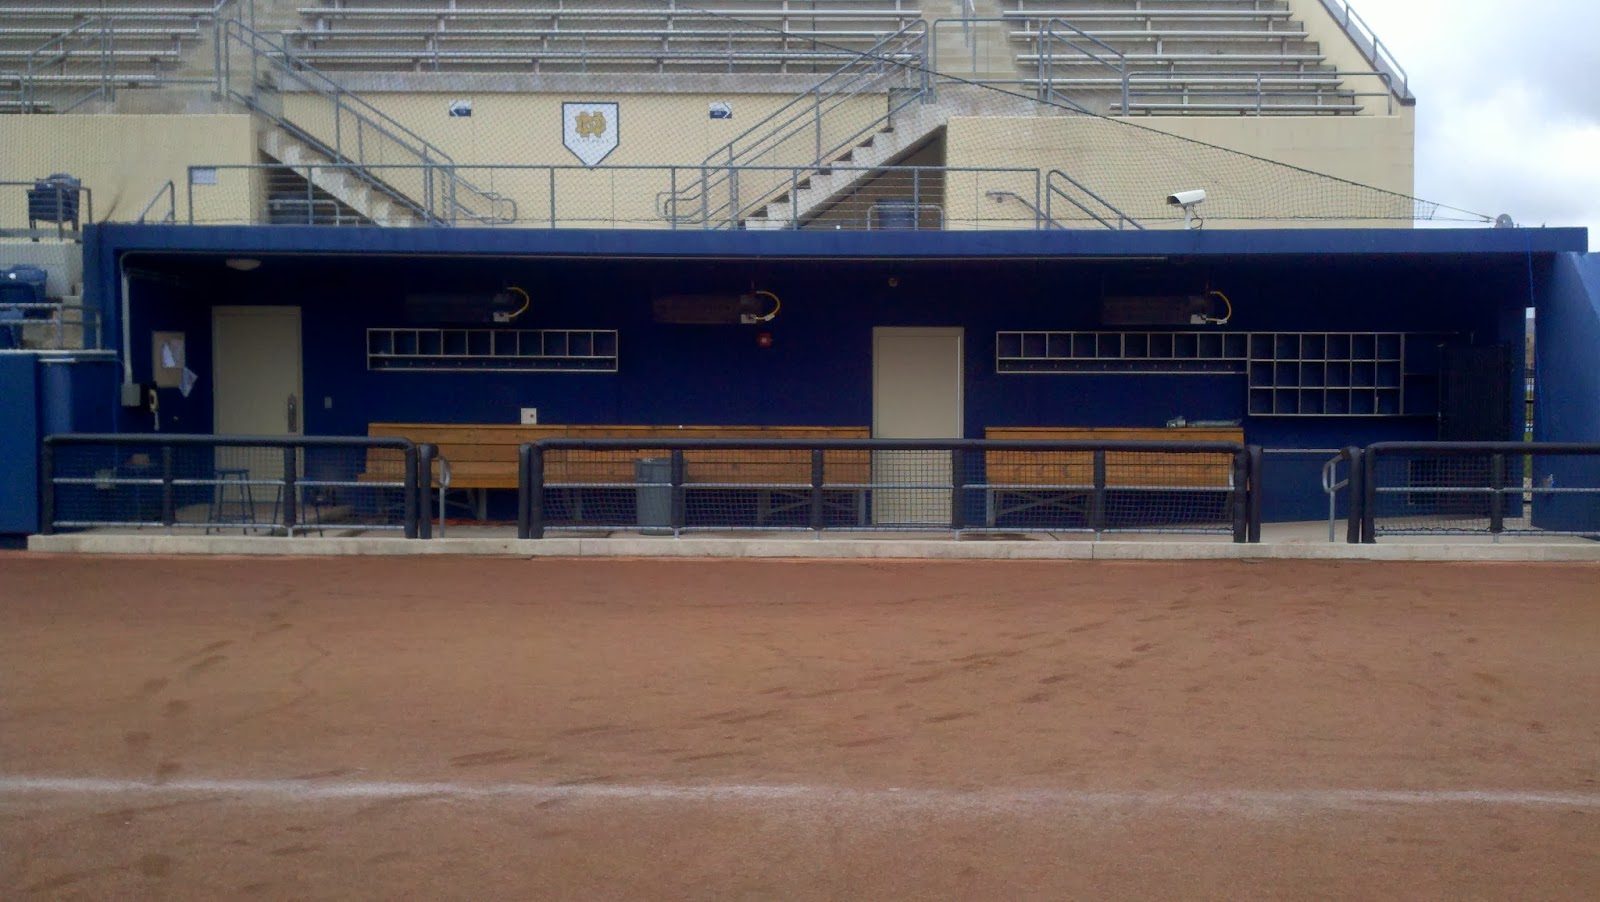 Baseball Dugout Bedroom Designs: Smart Turf: Baseball Field Dugout Design And Layout Vol 3